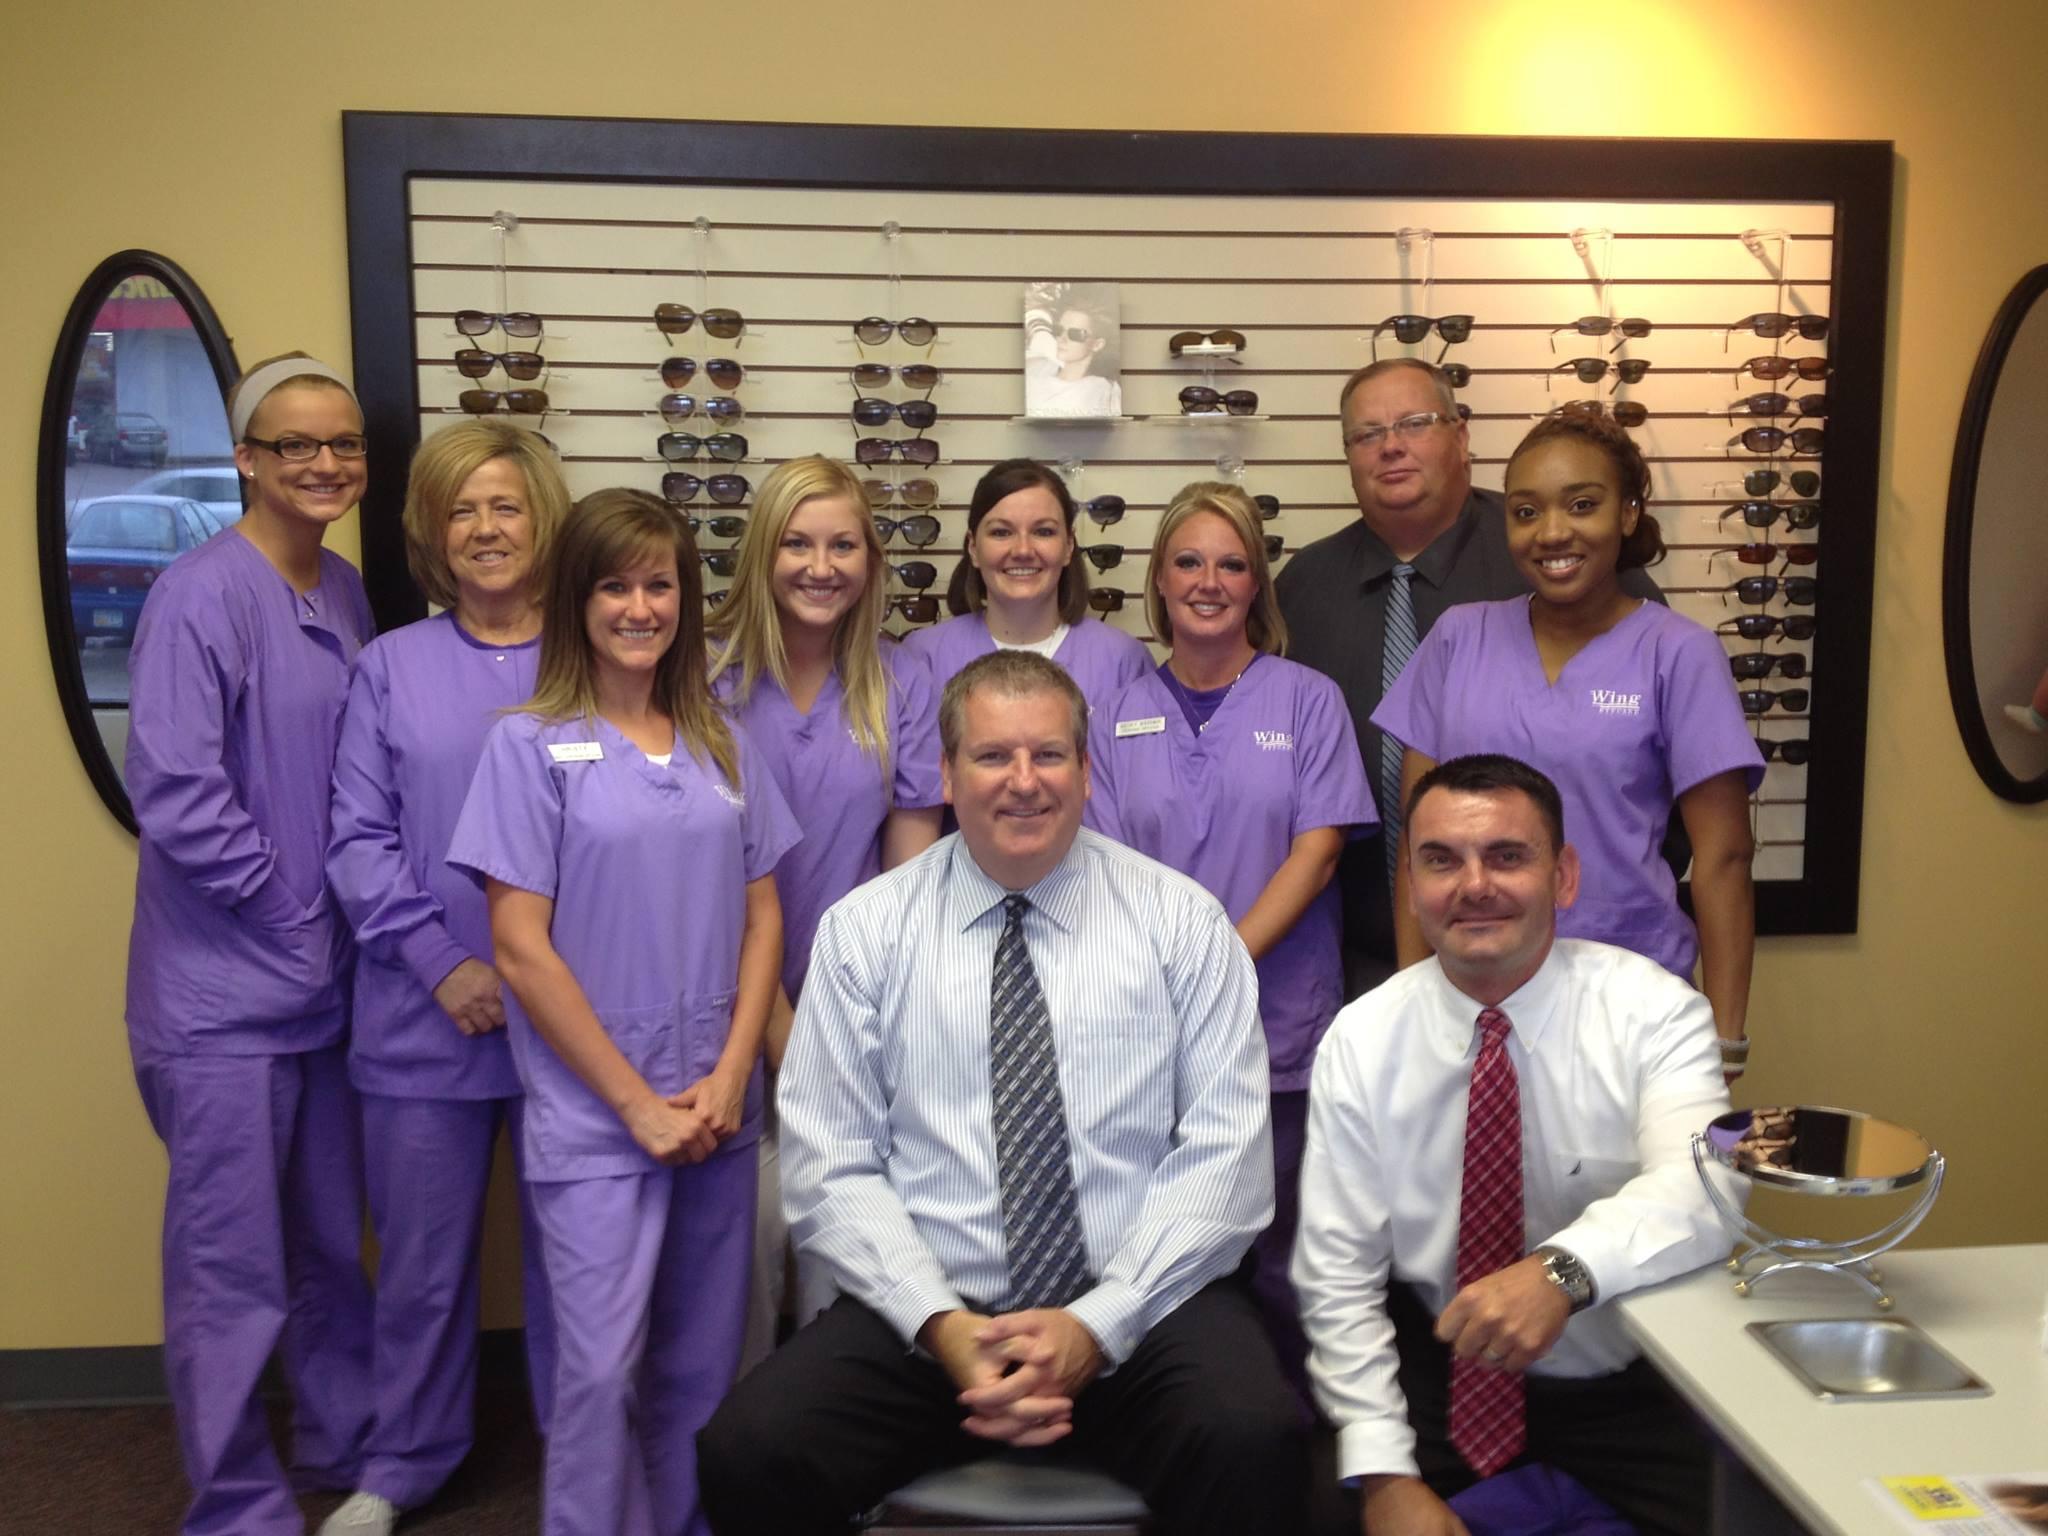 Mid Michigan Eye Care